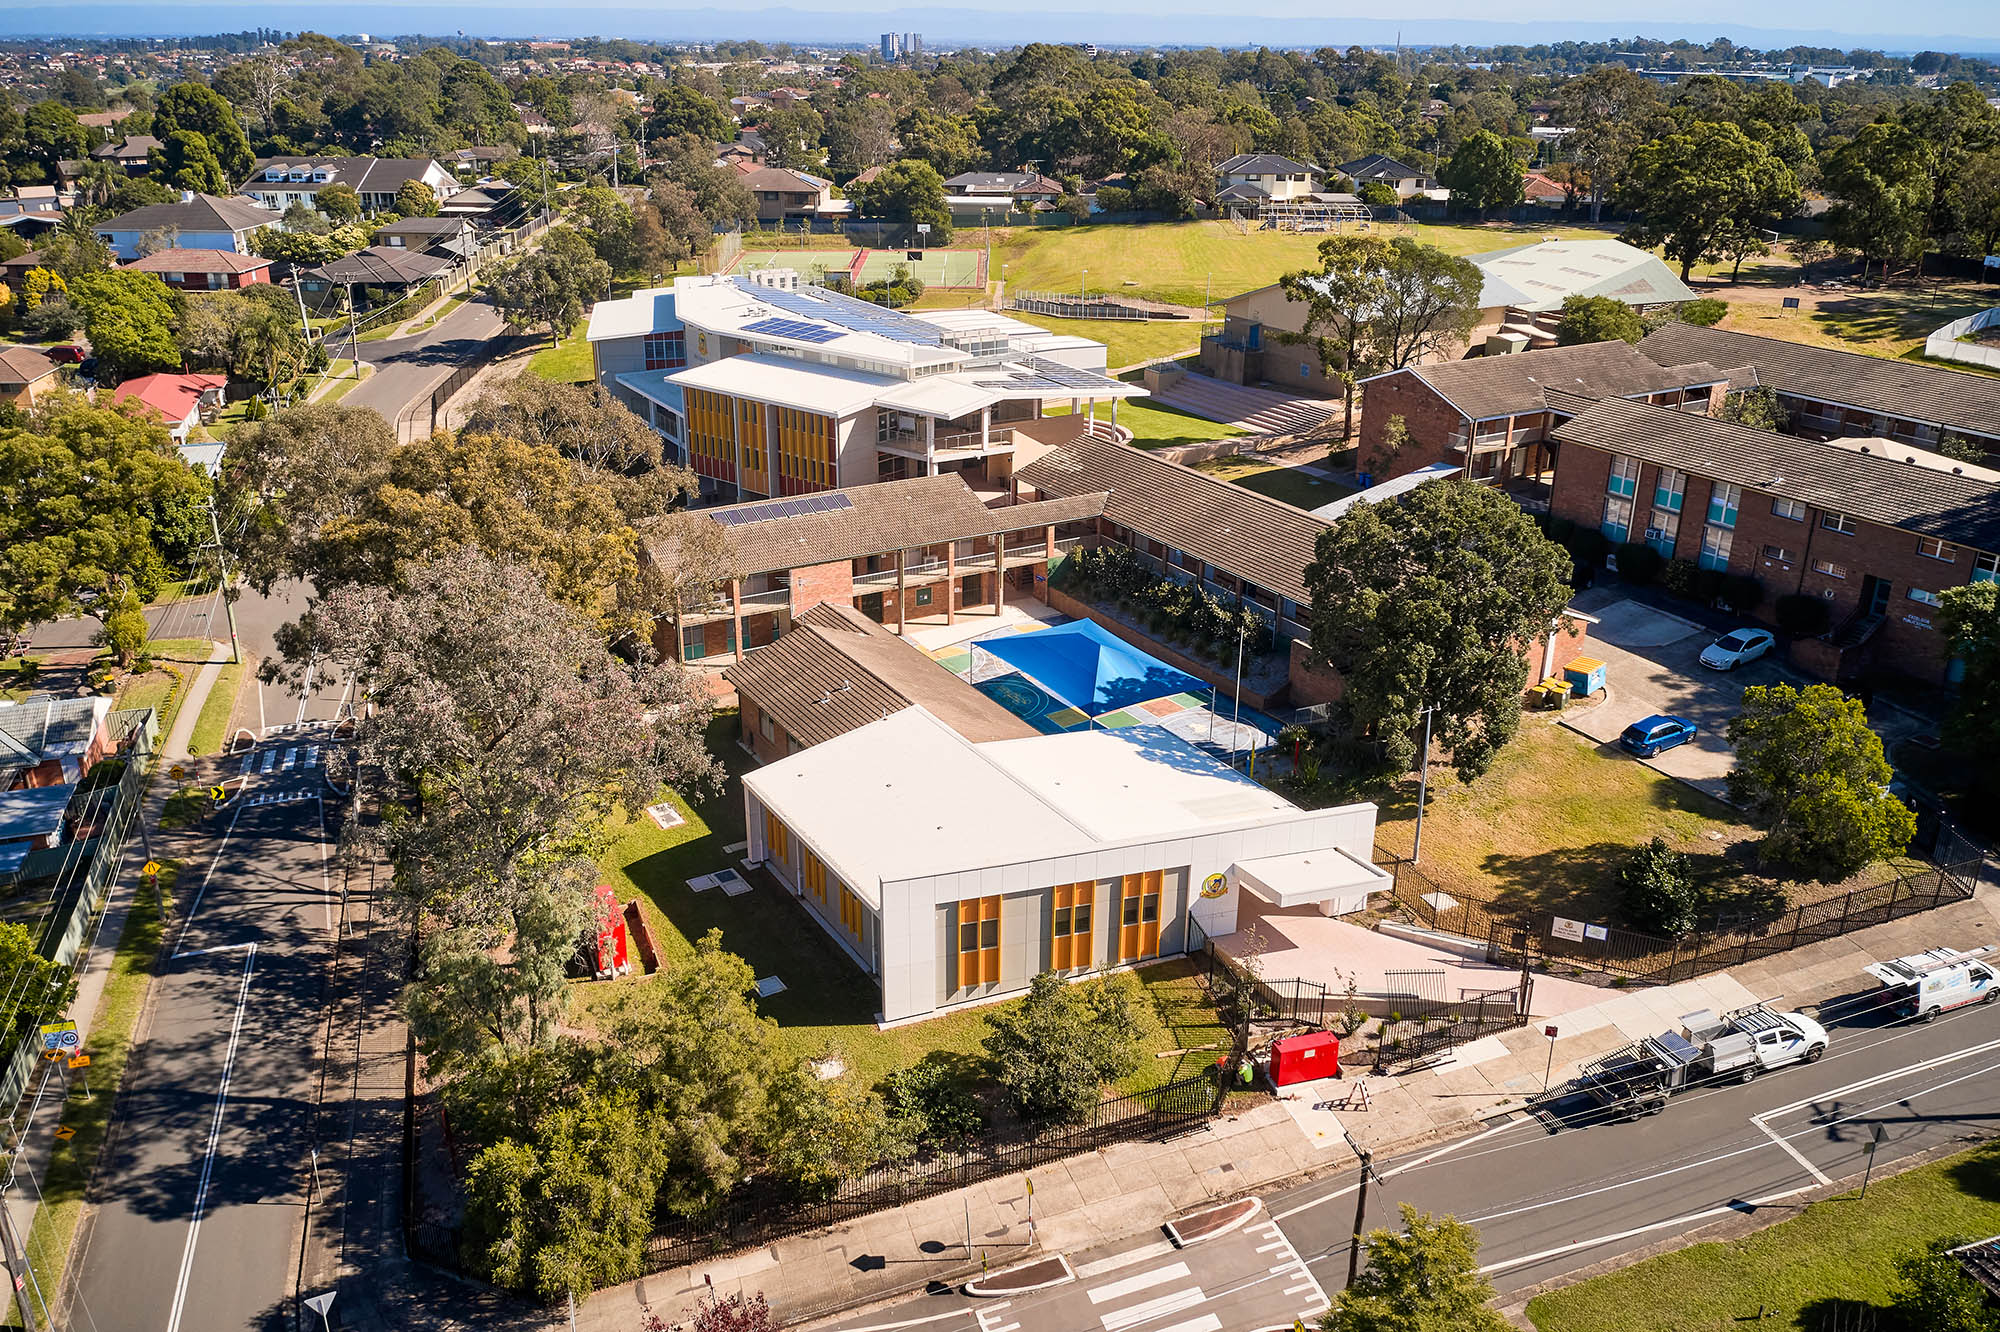 Excelsior Public School Architecture Overview Shot – Gardner Wetherill GW 8